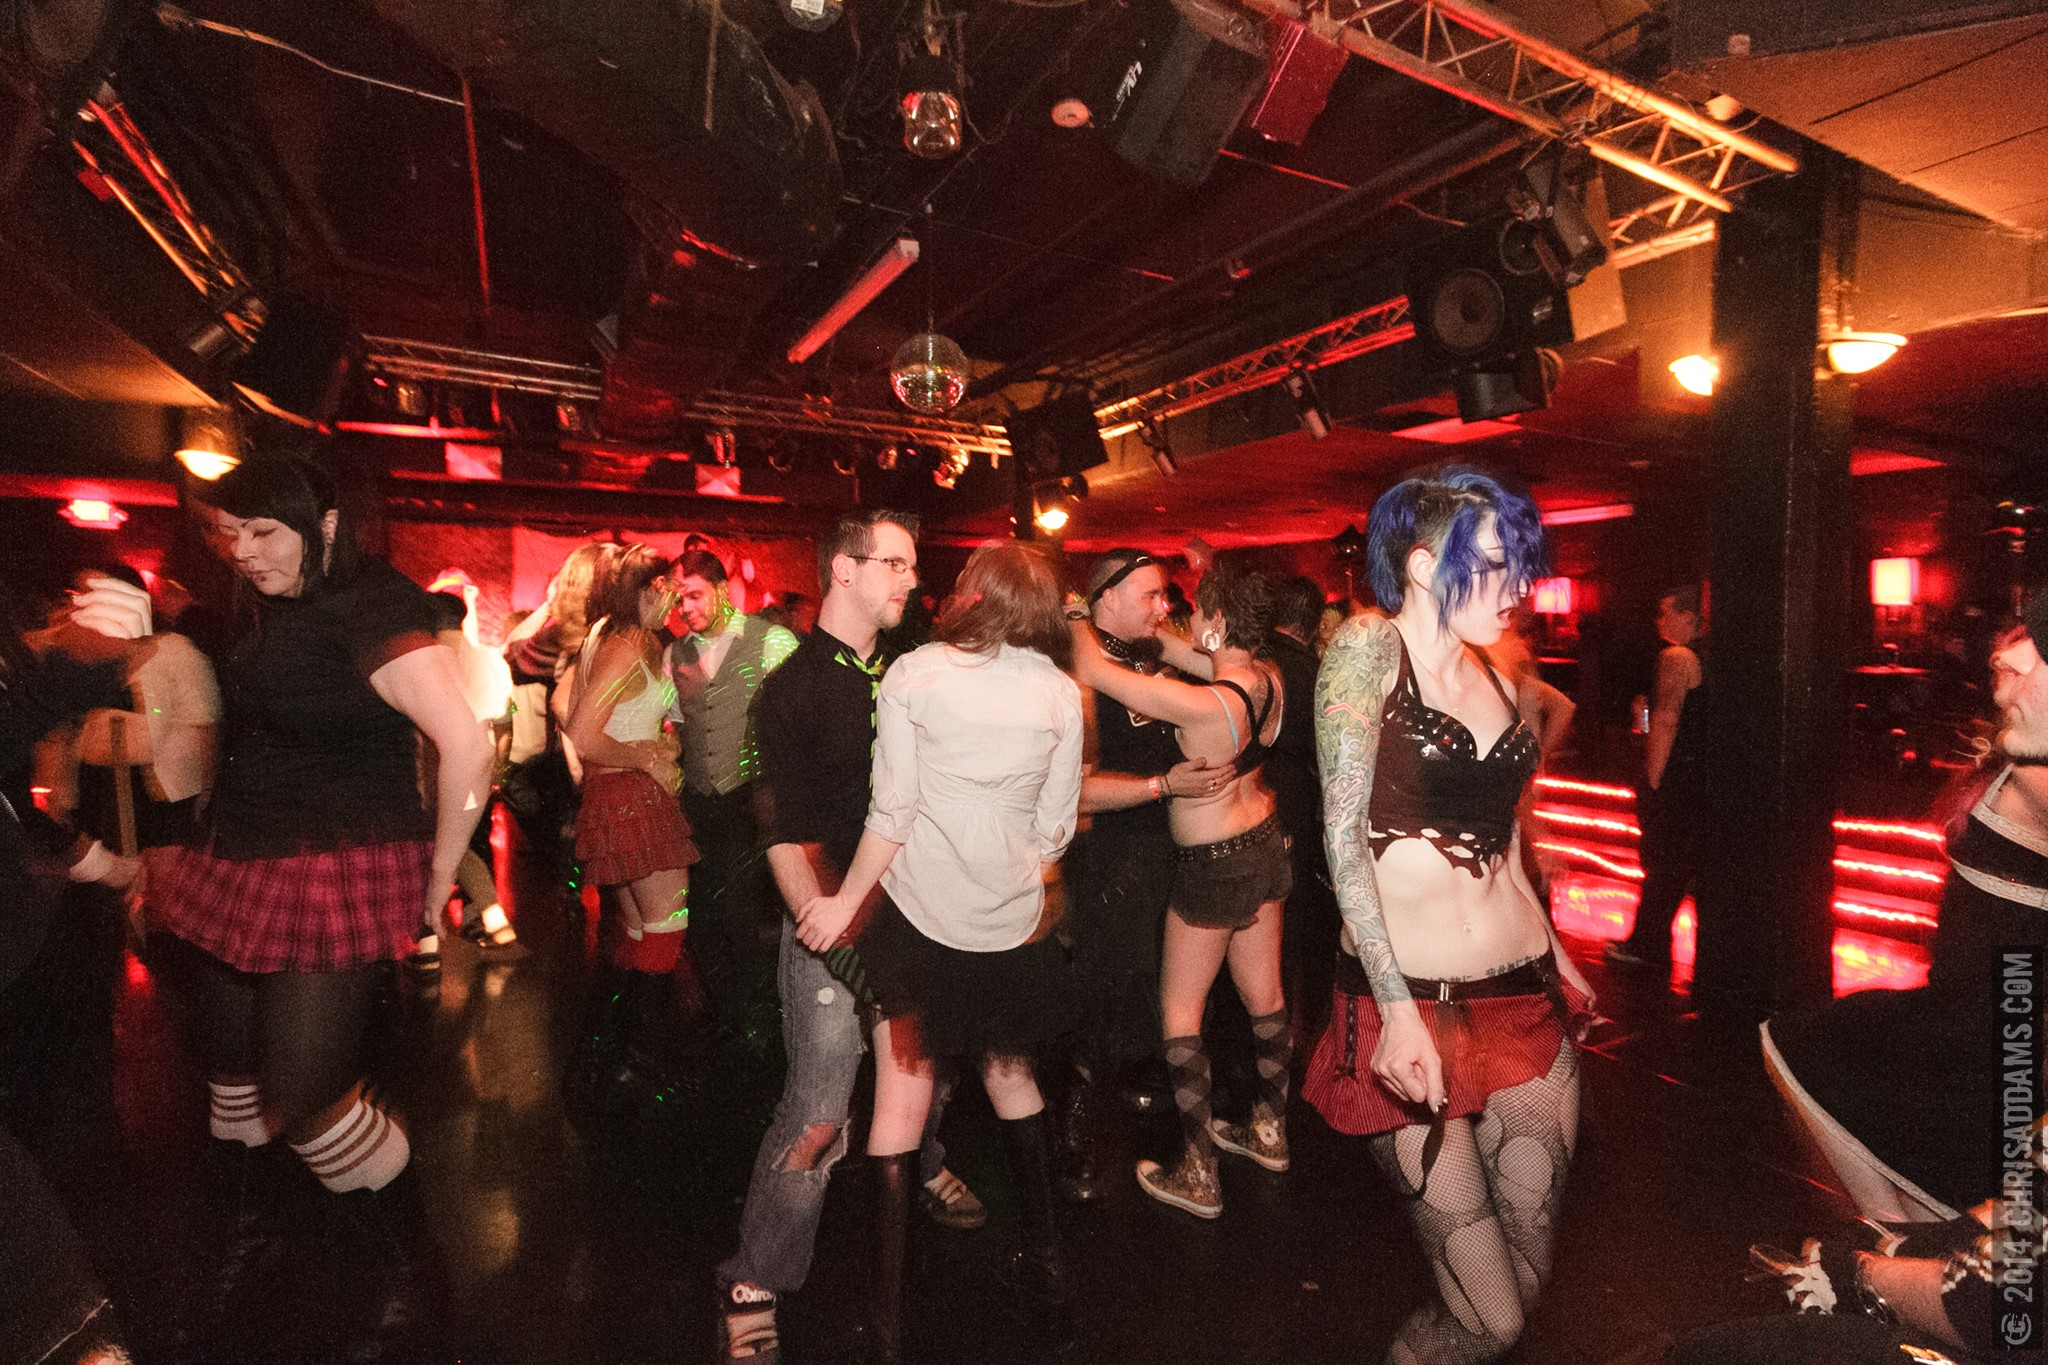 TheHavenClub-Goth-Industrial-Dance-Alternative-Northampton-MA (137).jpg